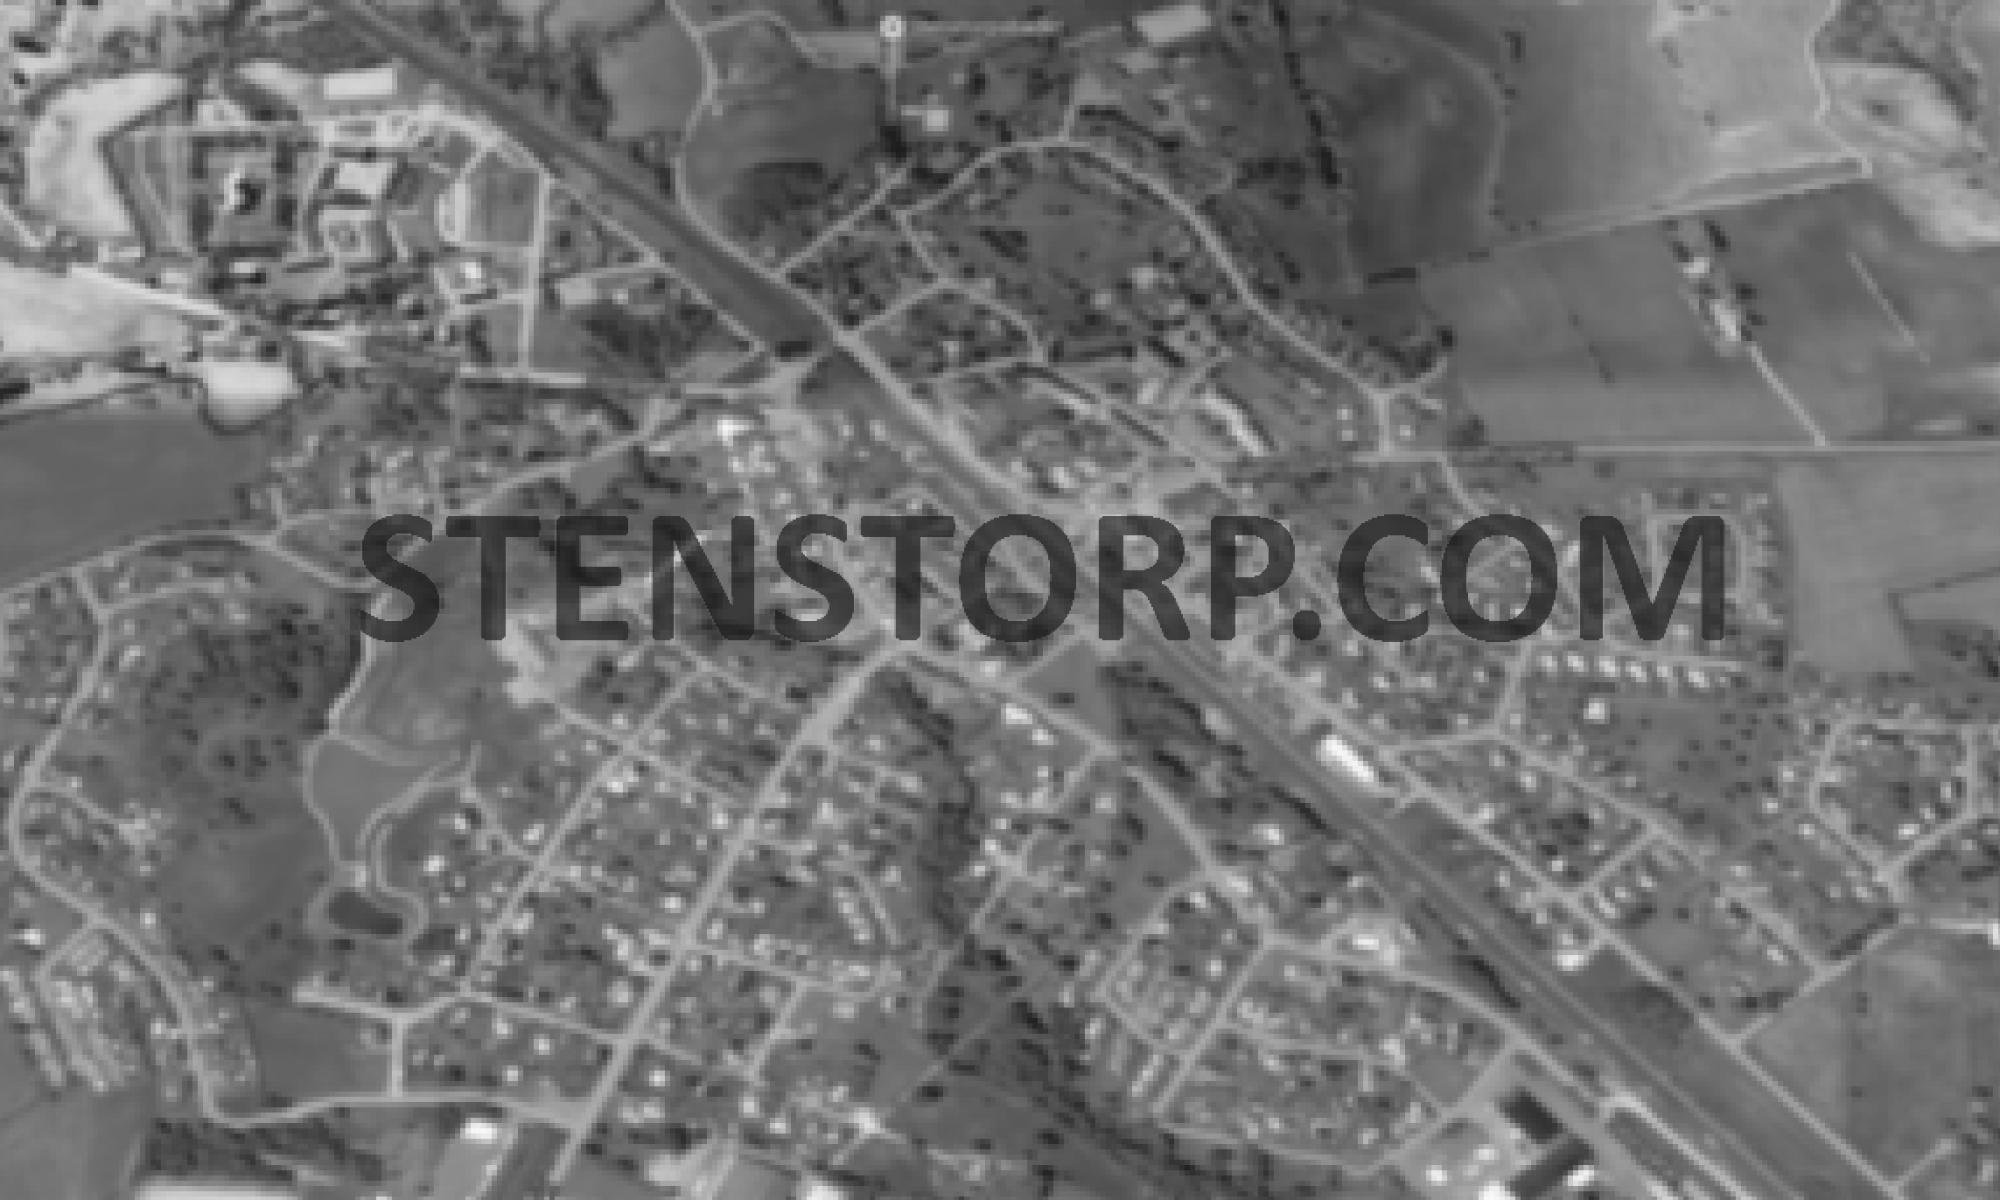 Stenstorp.com